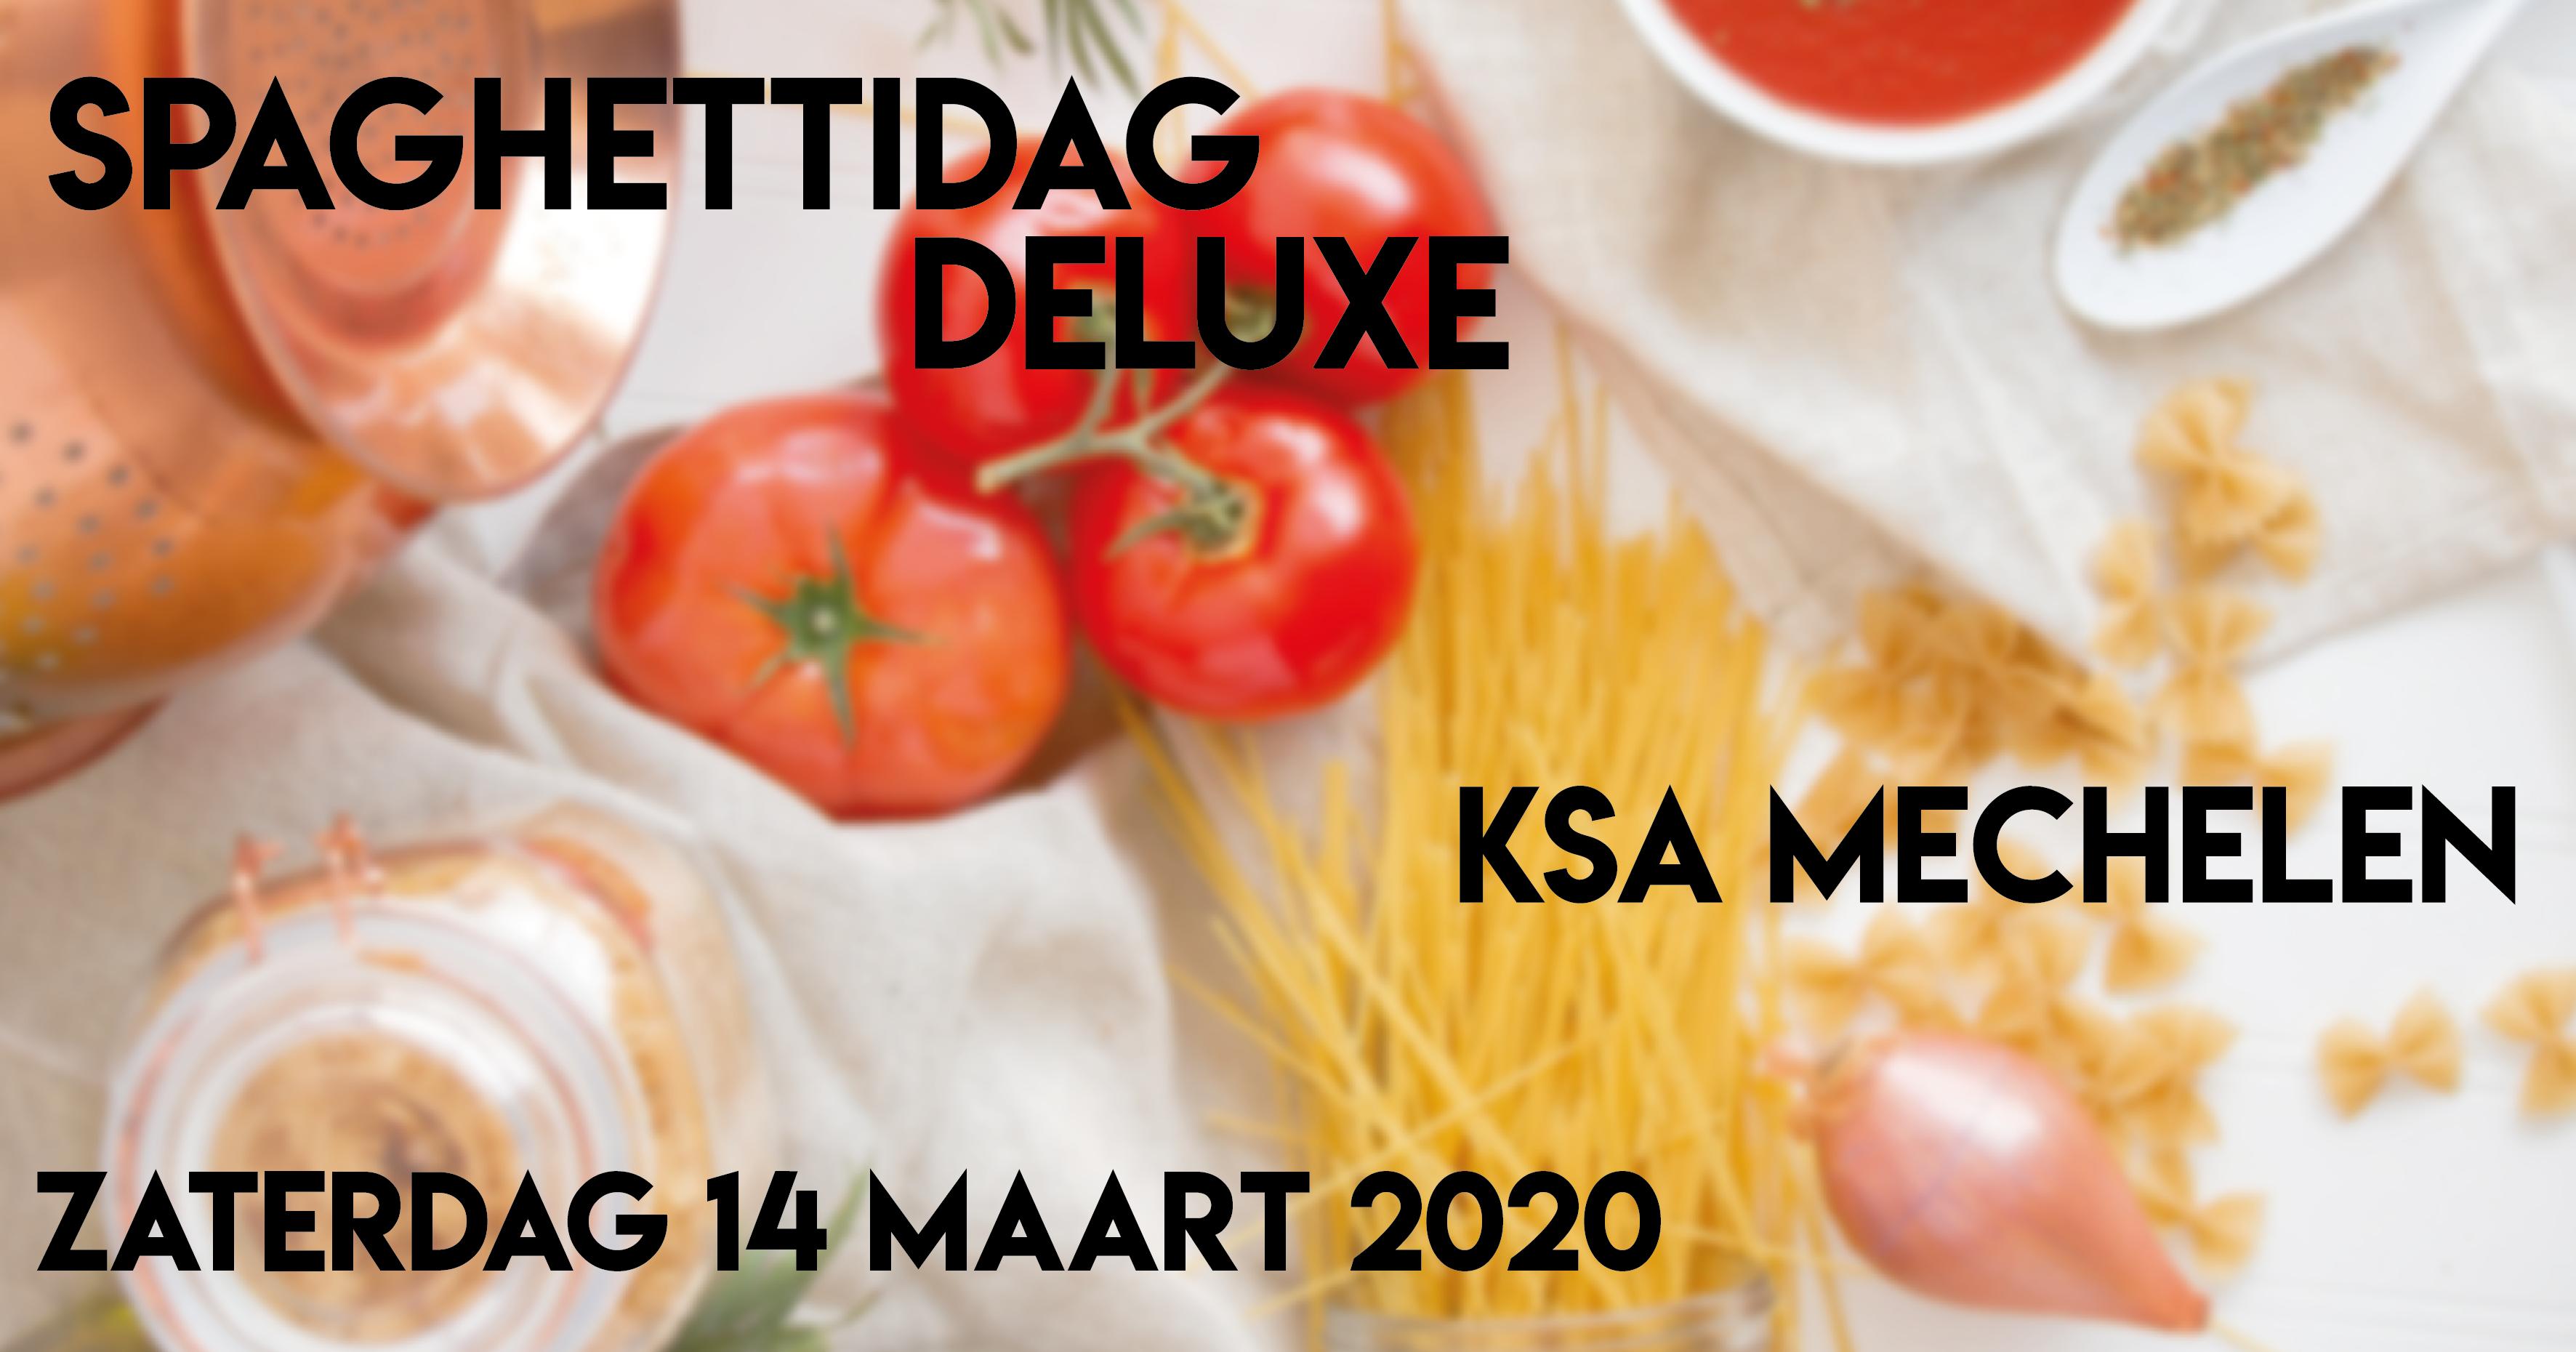 Spaghettidag deluxe – 14 maart